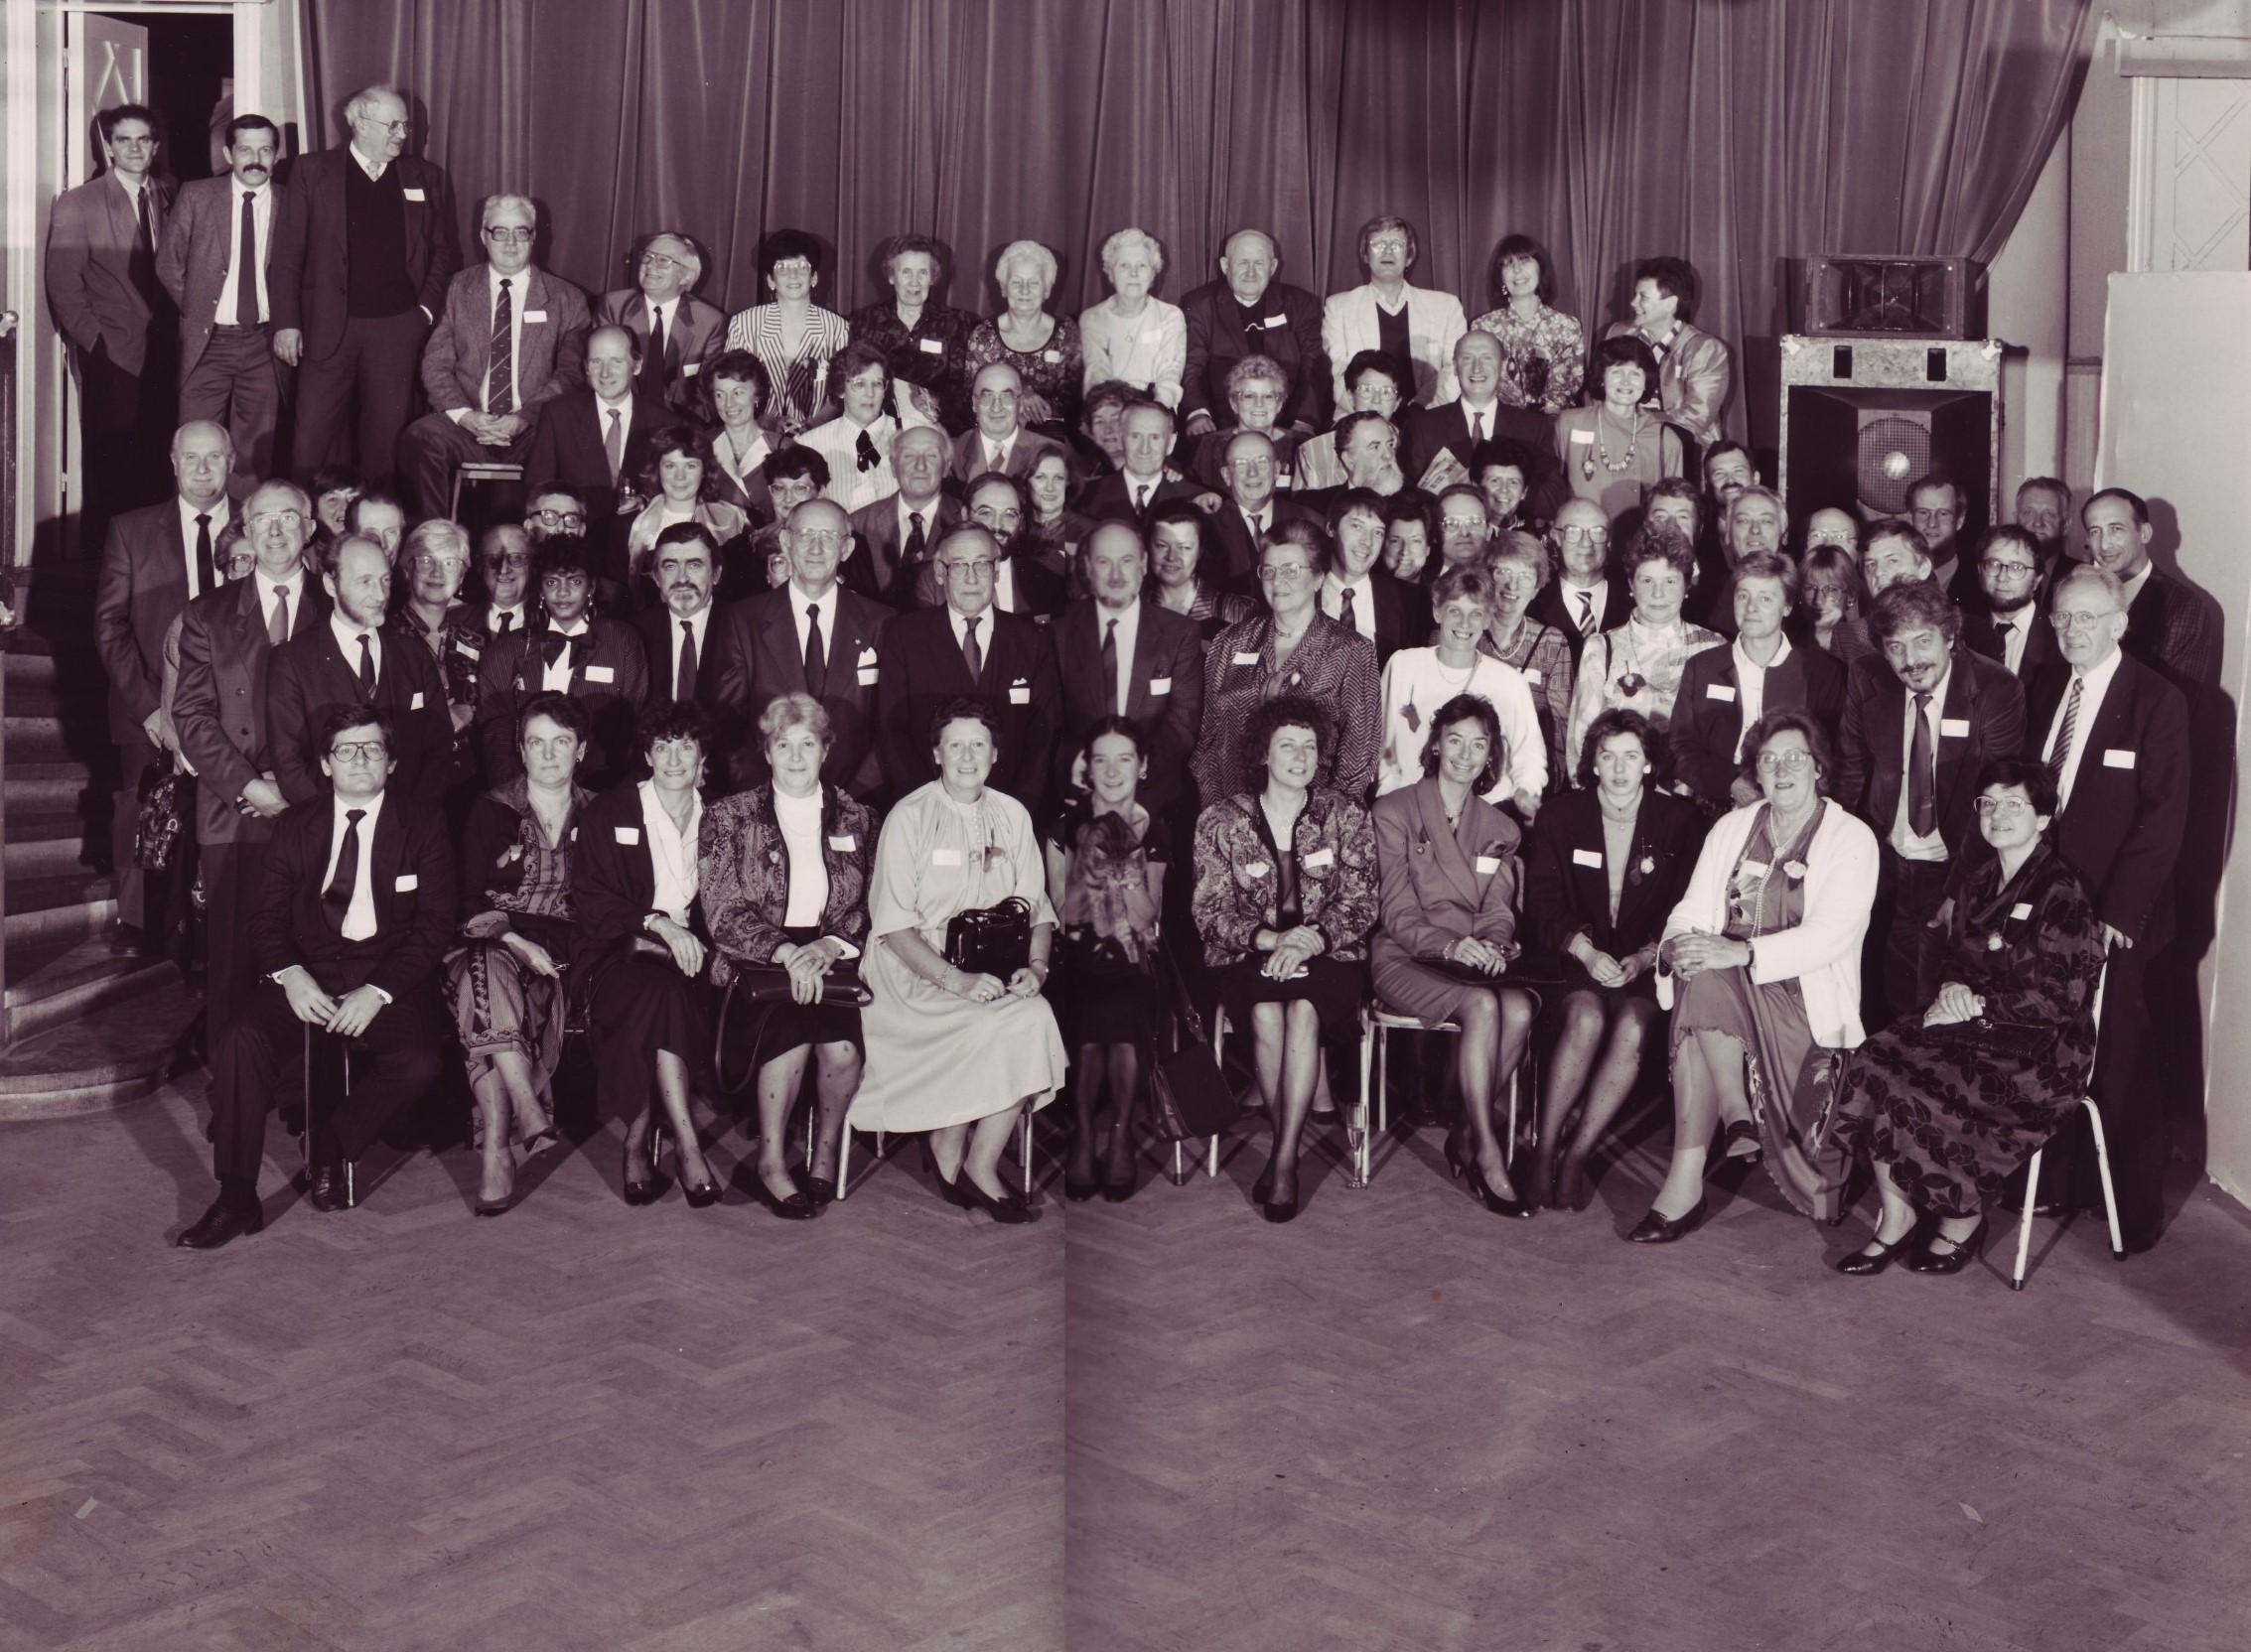 527B. Syndicat d'Initiative de Rixensart (20ème anniversaire) novembre 1988 c Paul Tagnon